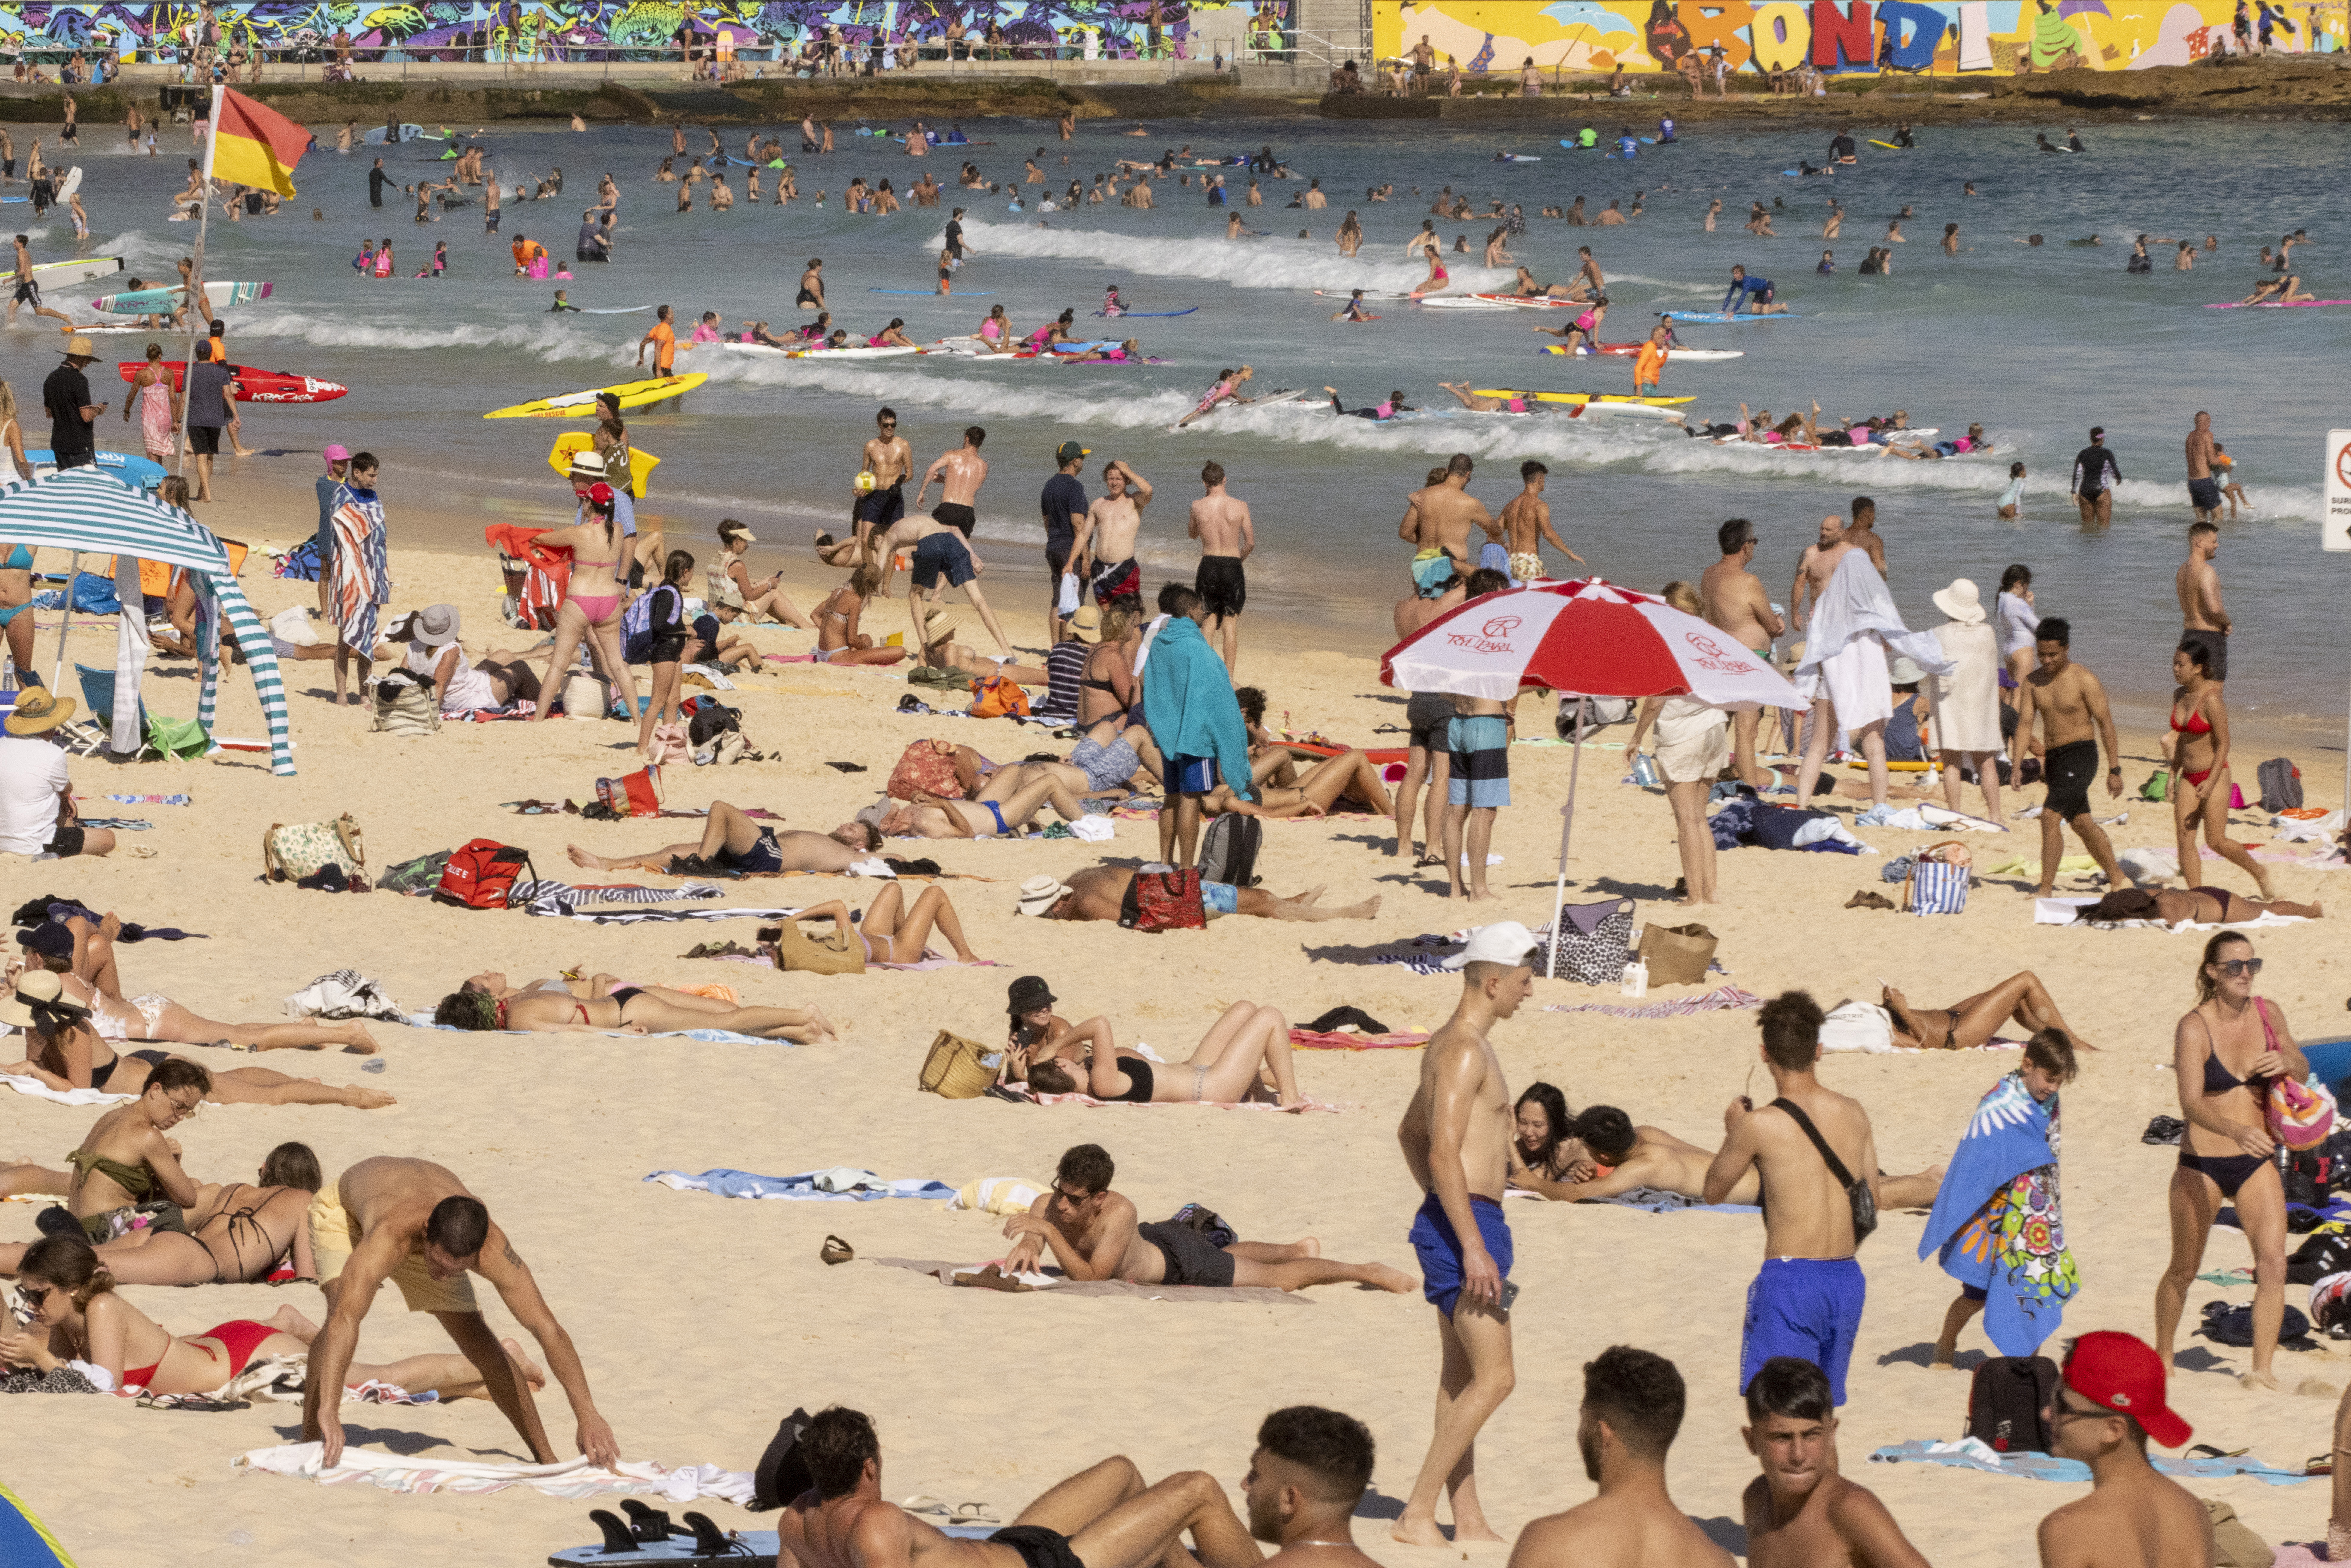 A general view of Bondi Beach on January 18, 2021 in Sydney, Australia.